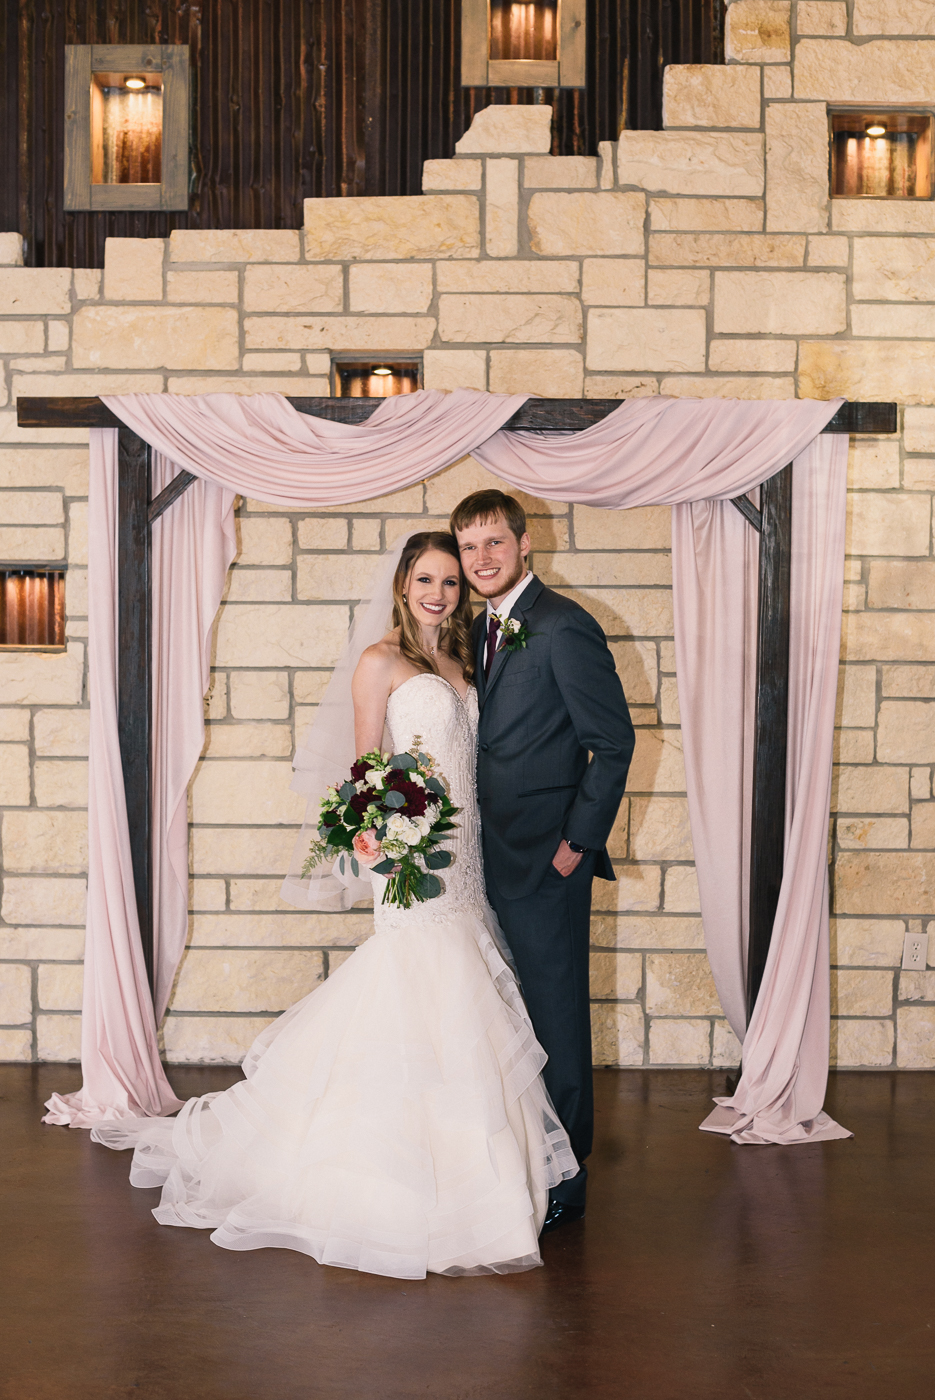 Wedding altar bride and groom husband and wife mermaid gown wedding bouquet wedding portrait